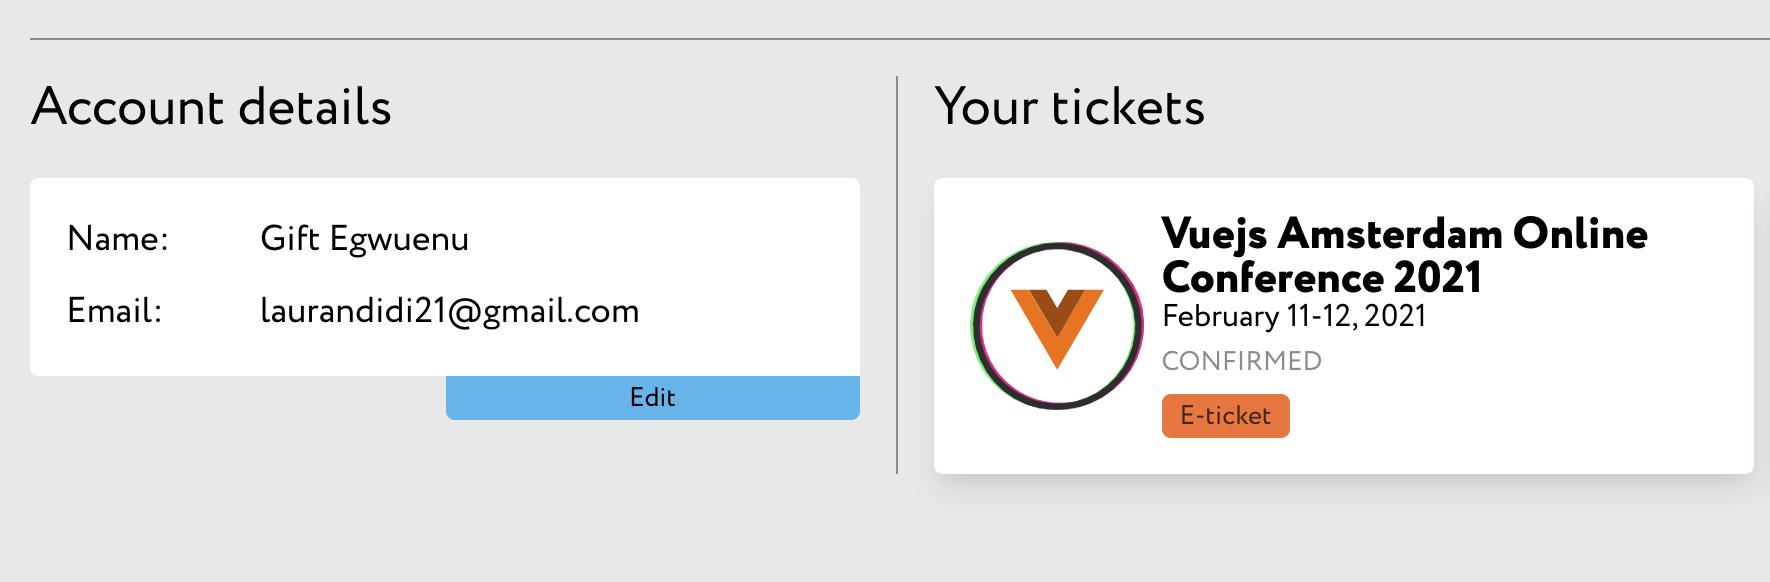 Vuejs amsterdam 2021 ticket